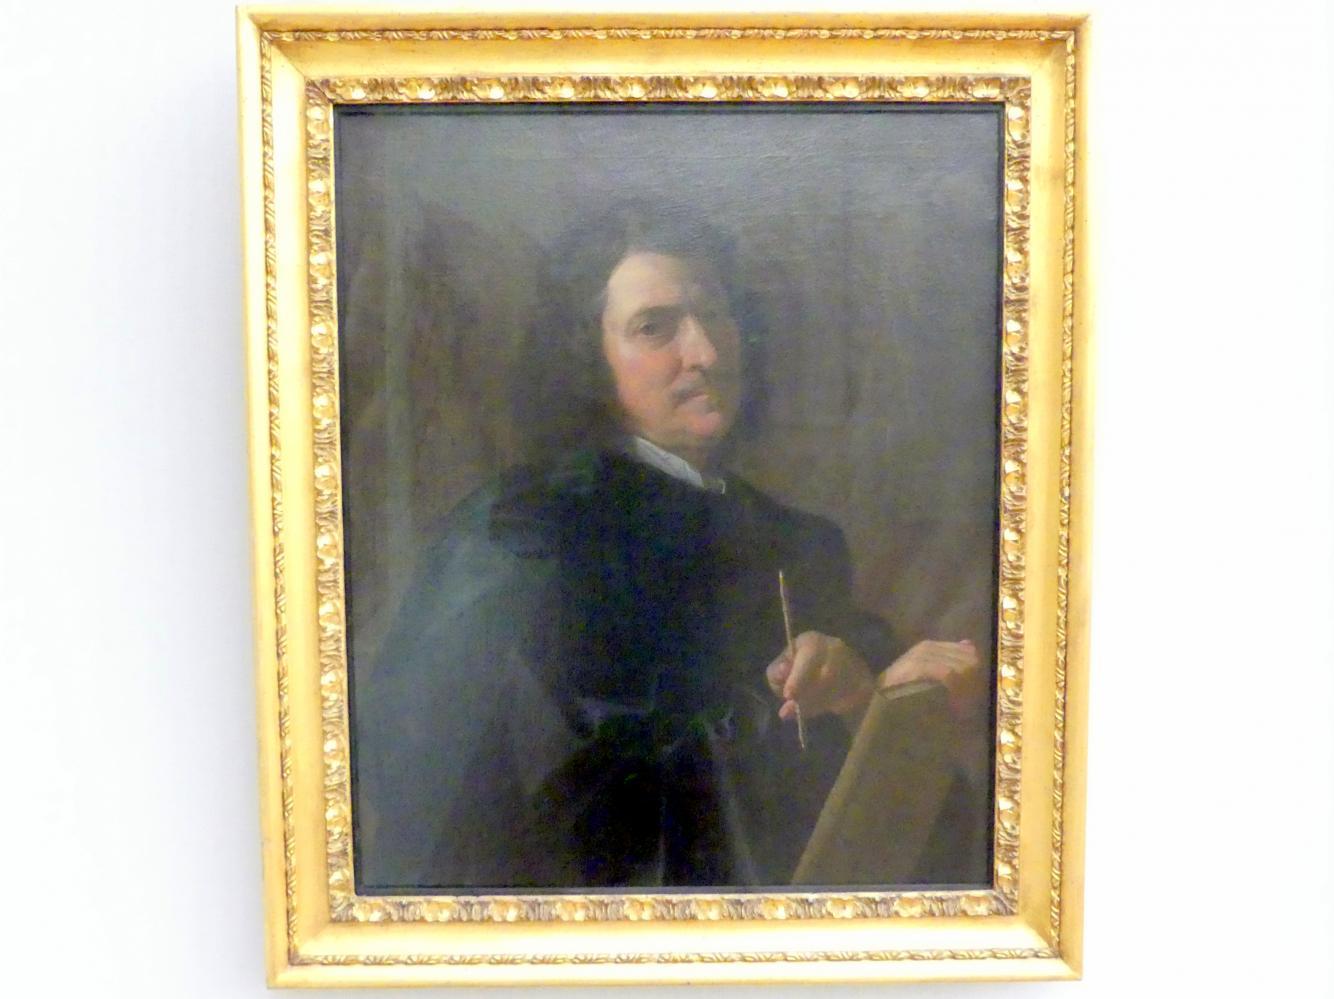 Nicolas Poussin (1594 Les Andelys - 1665 Rom)